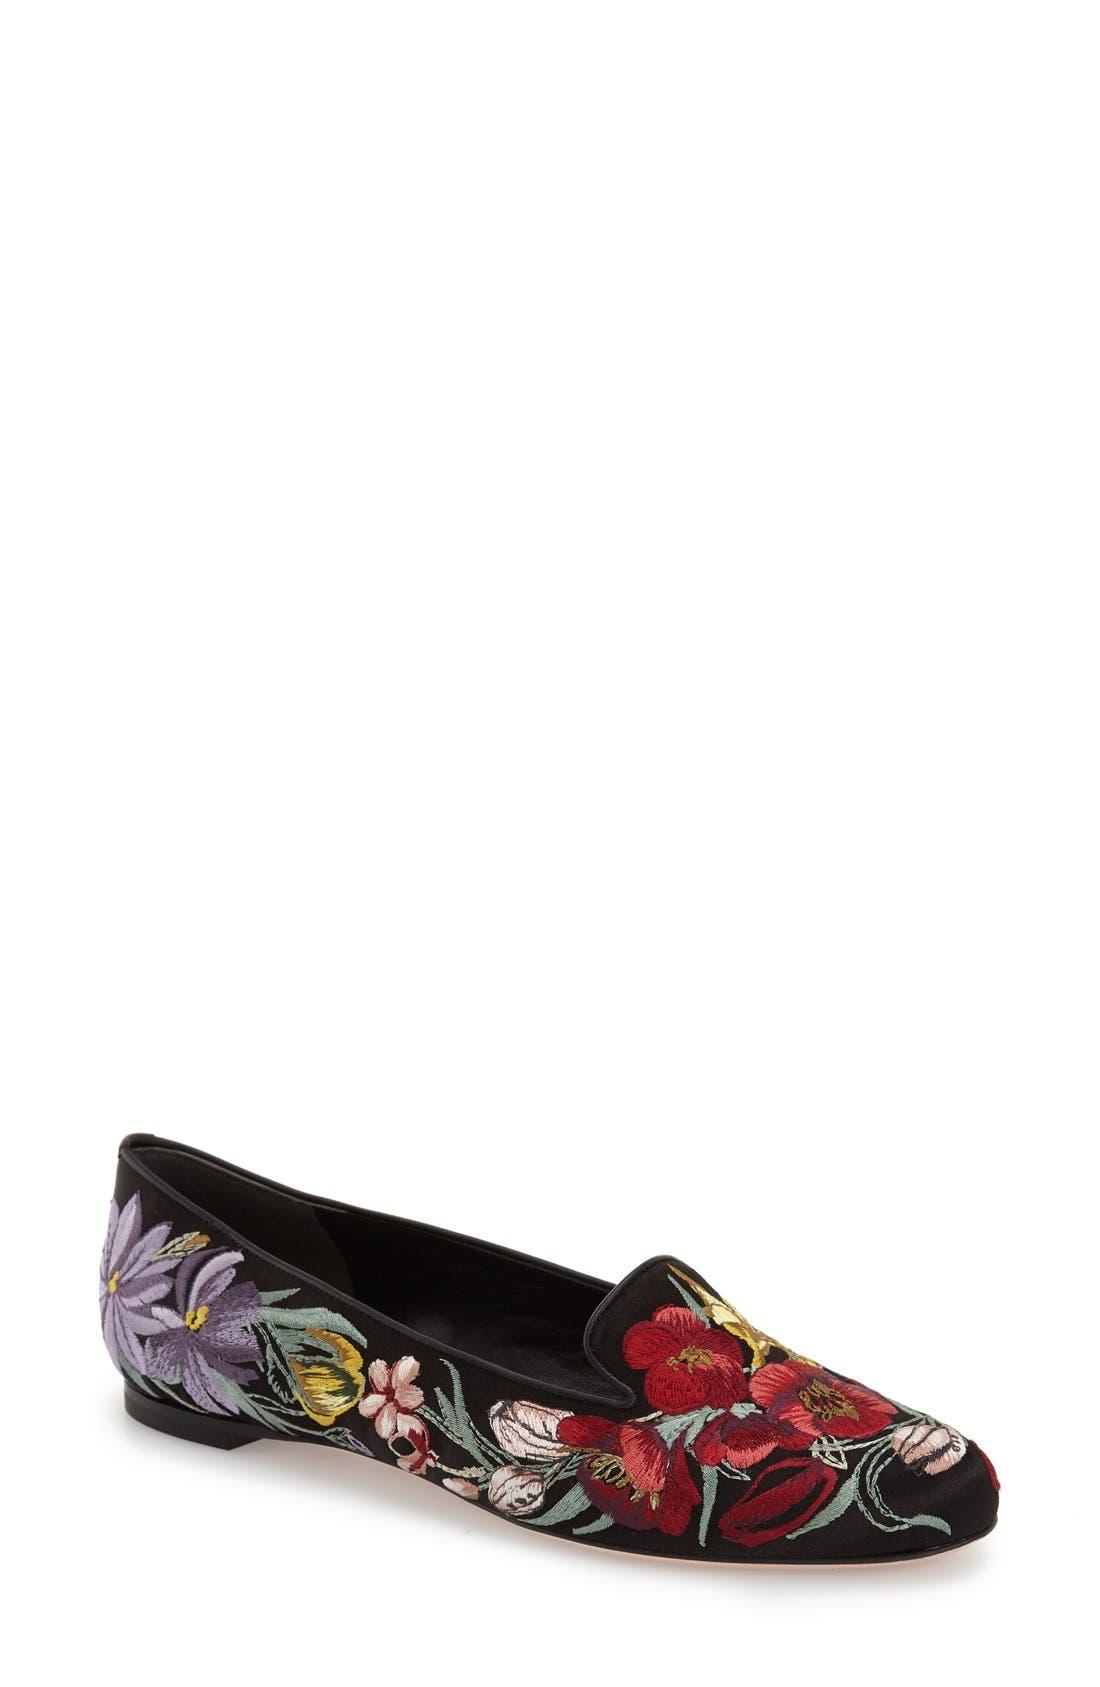 Alternate Image 1 Selected - Alexander McQueen Embroidered Flower Loafer (Women)